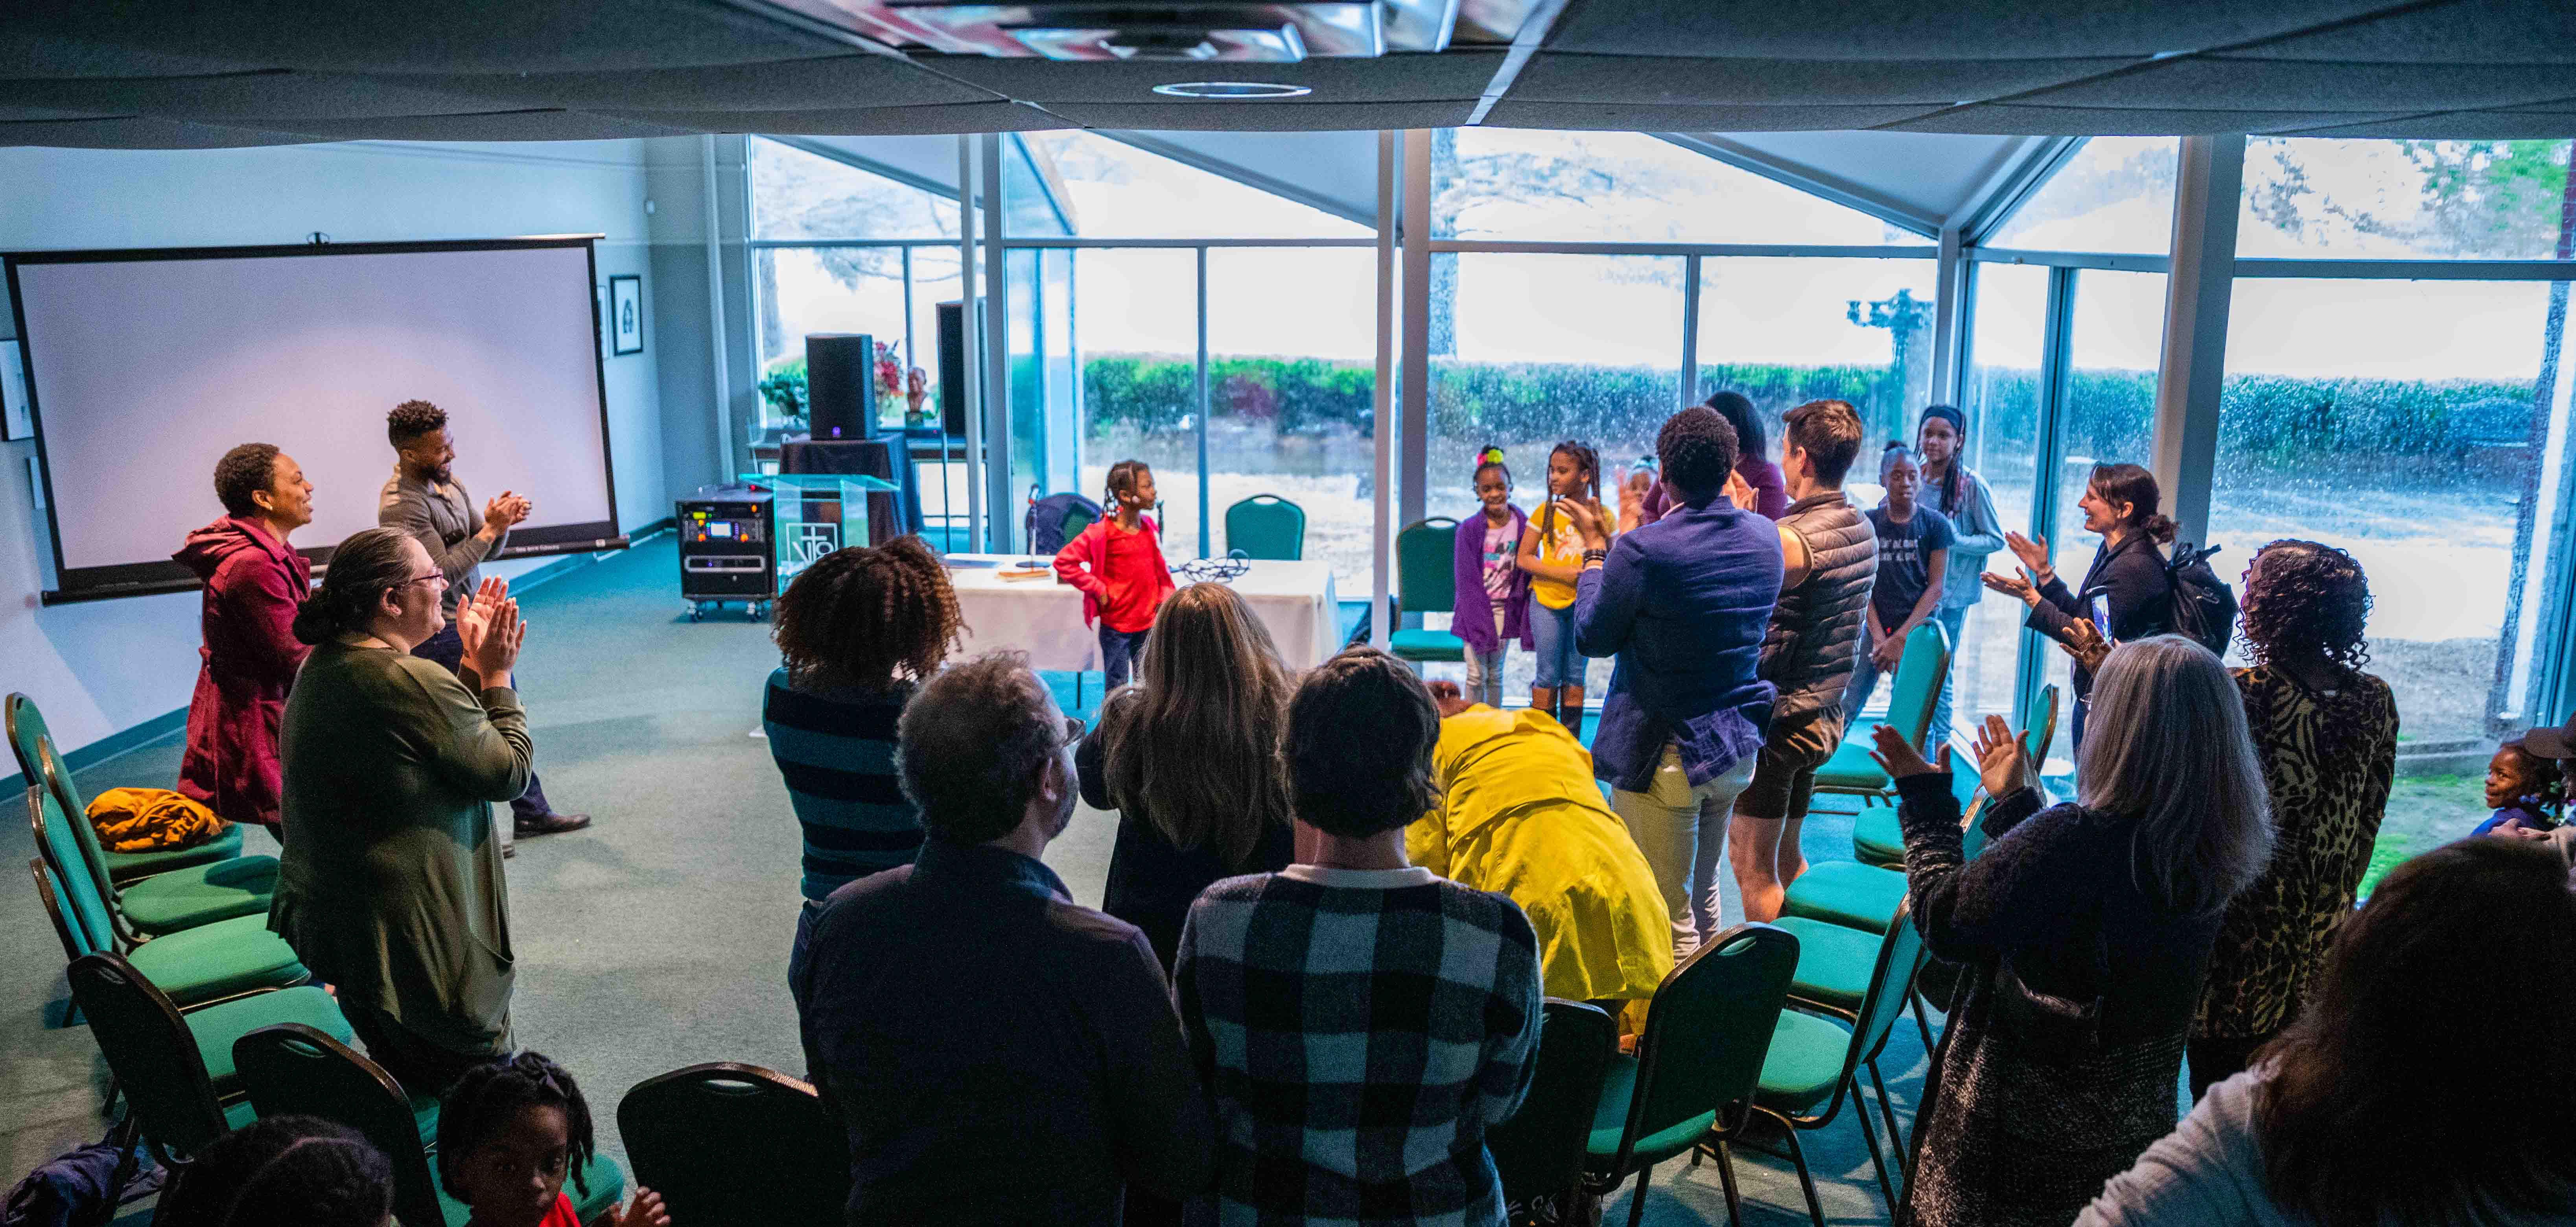 A girl gives a presentation at Greenwood Cultural Center in Tulsa, Oklahoma.